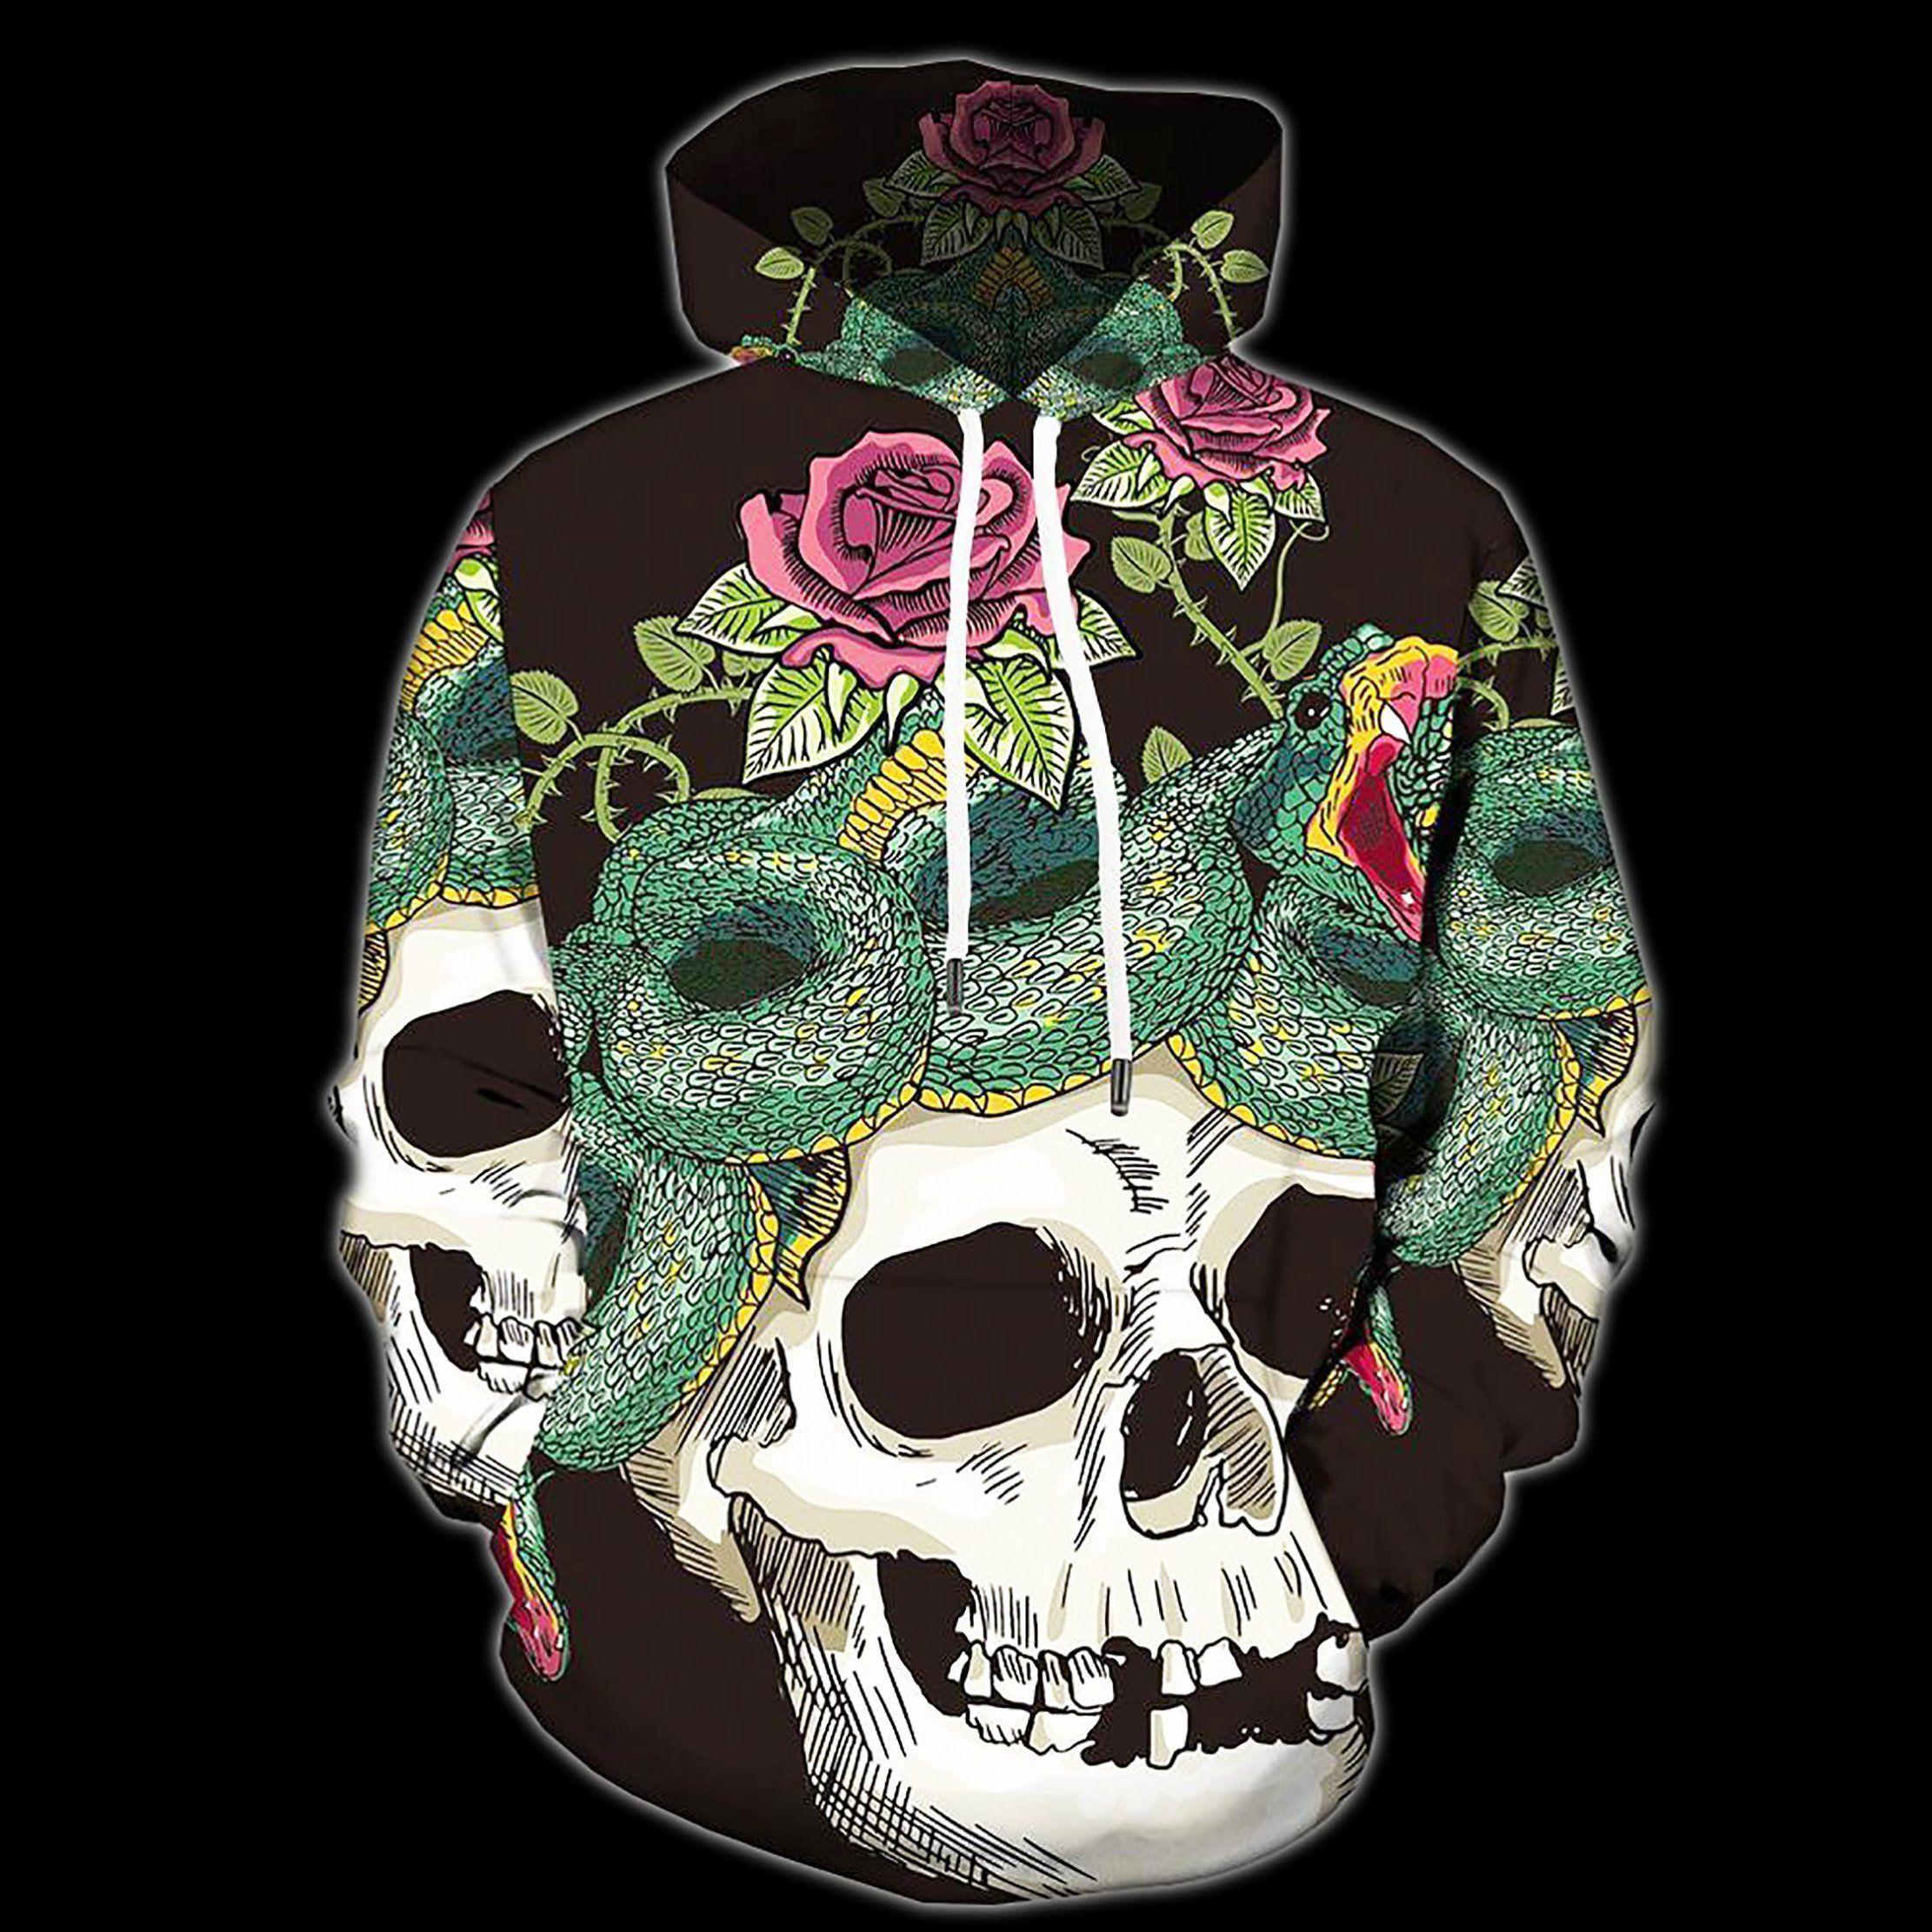 Photo of Dope Skull Hoodies – Snakes, Roses & Skulls / 4XL